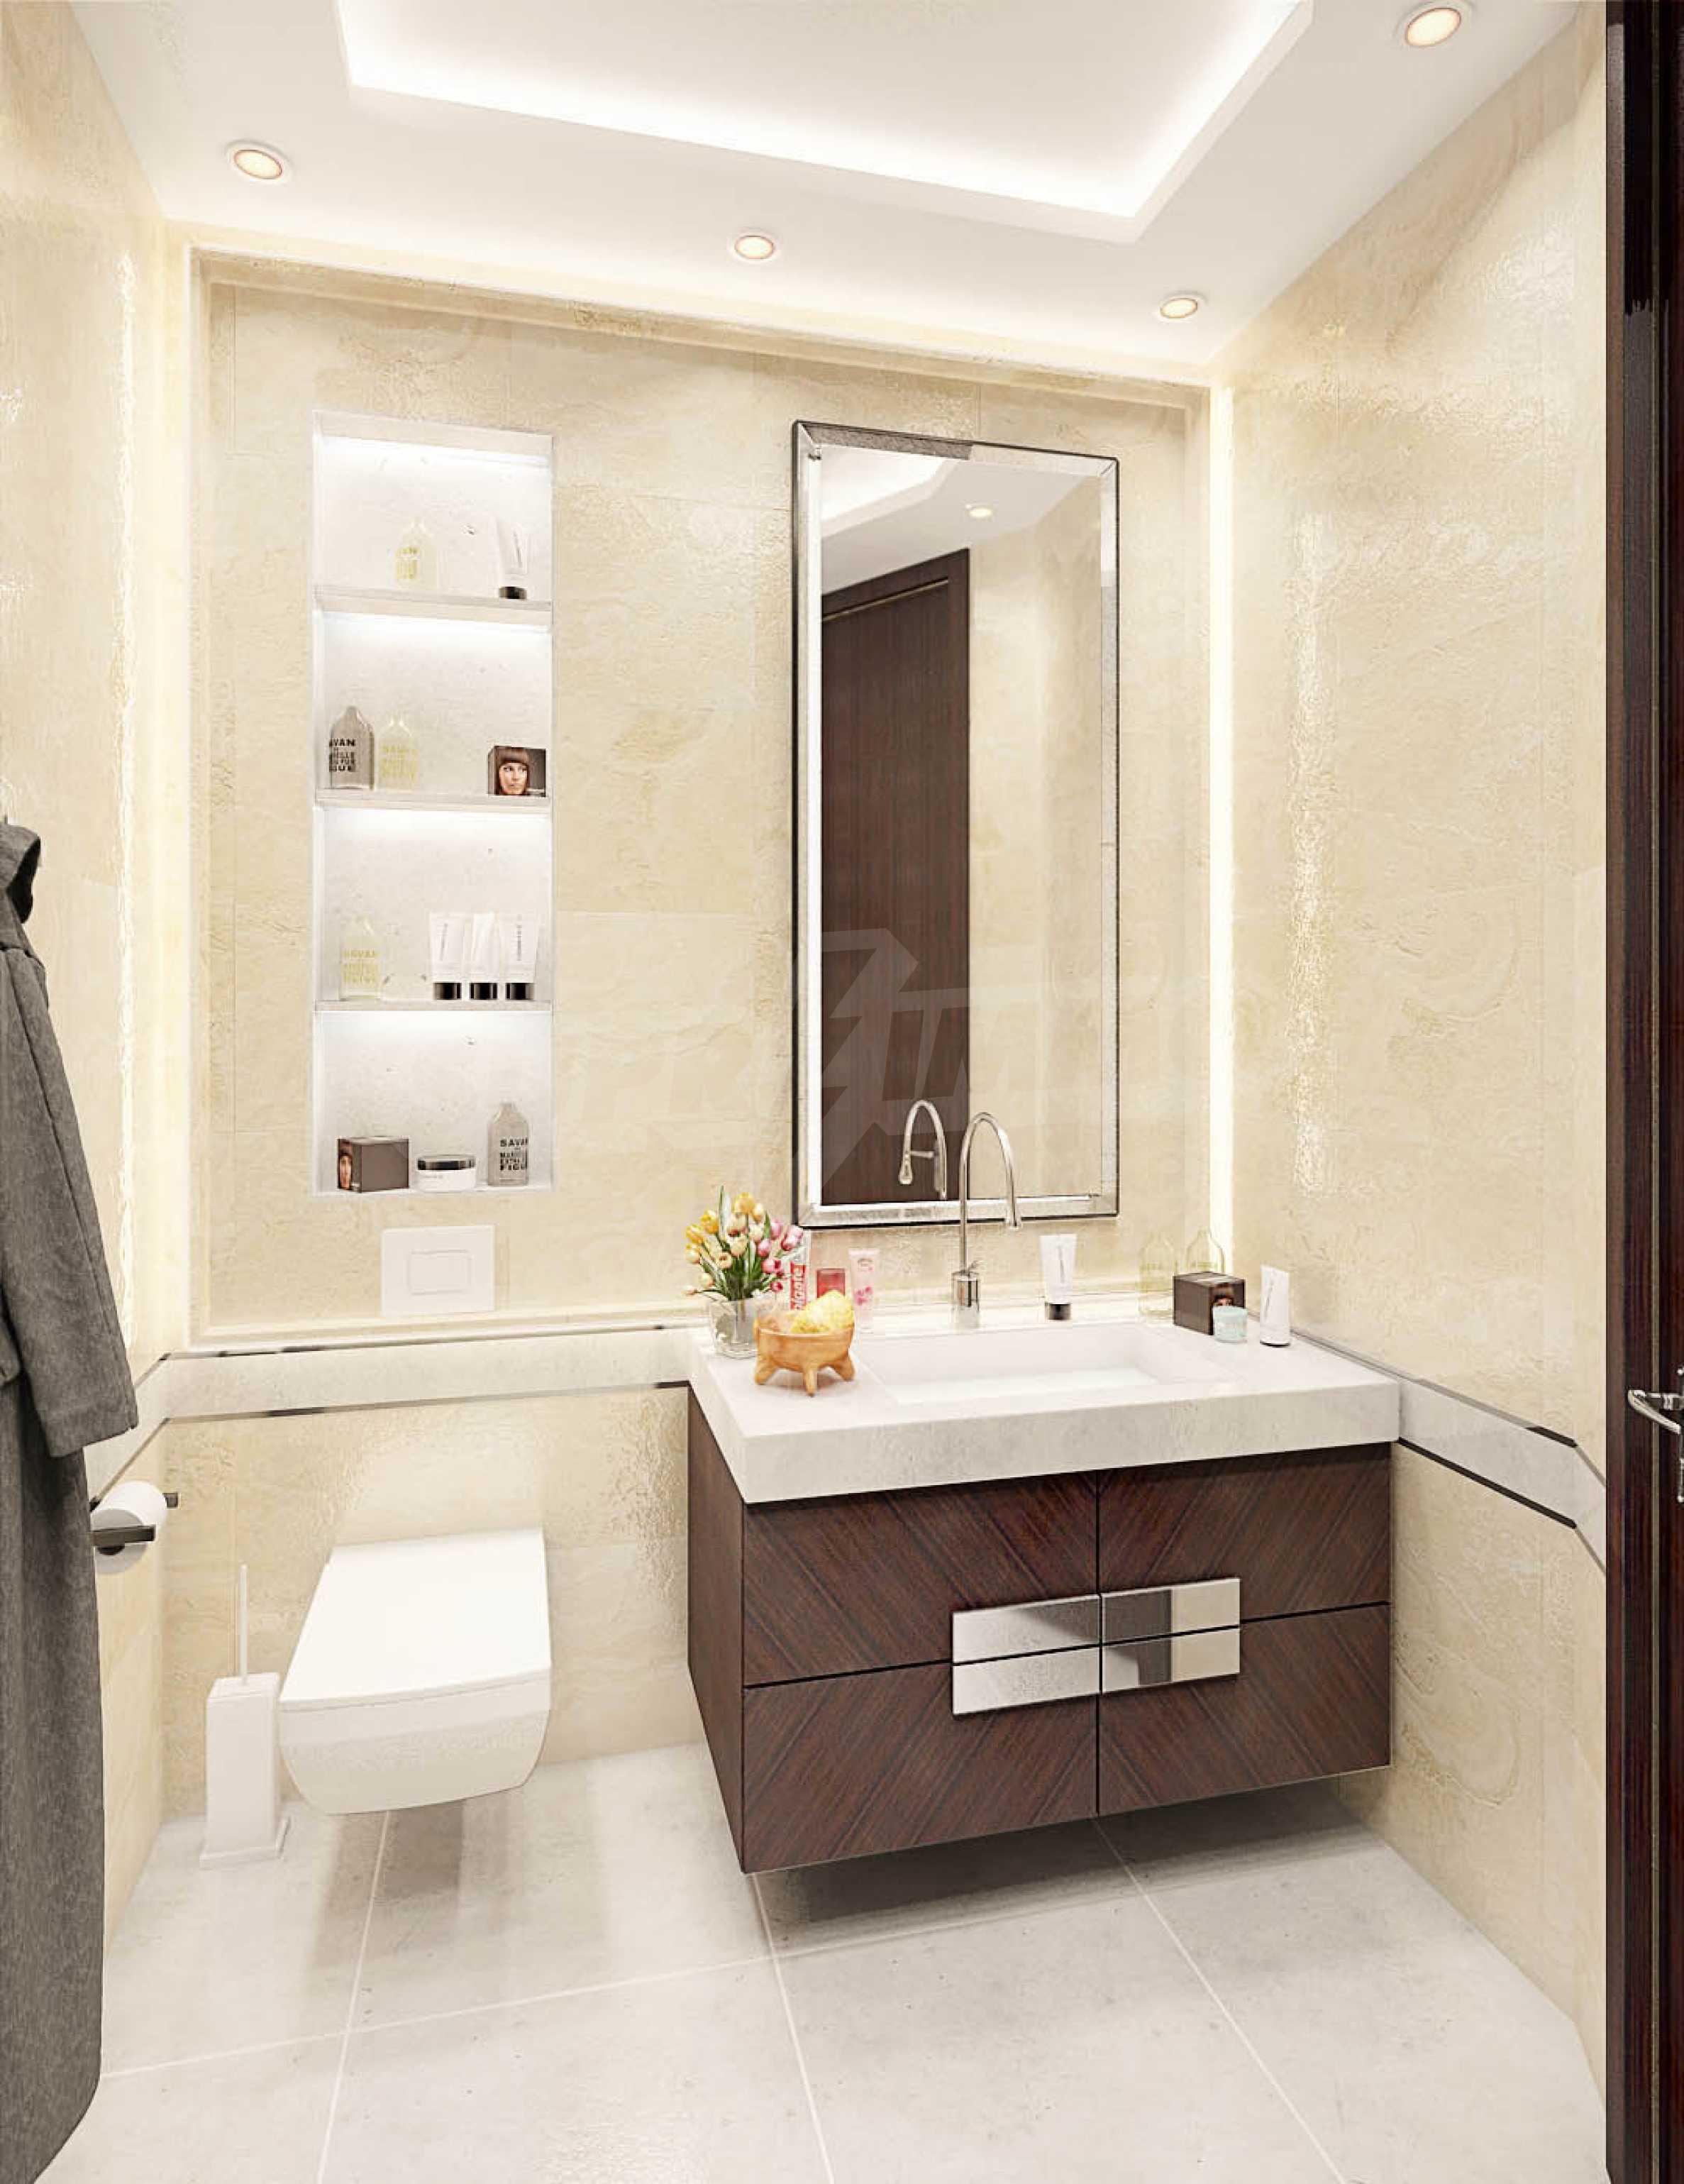 Нова сграда с луксозни апартаменти в гр. Бургас 62